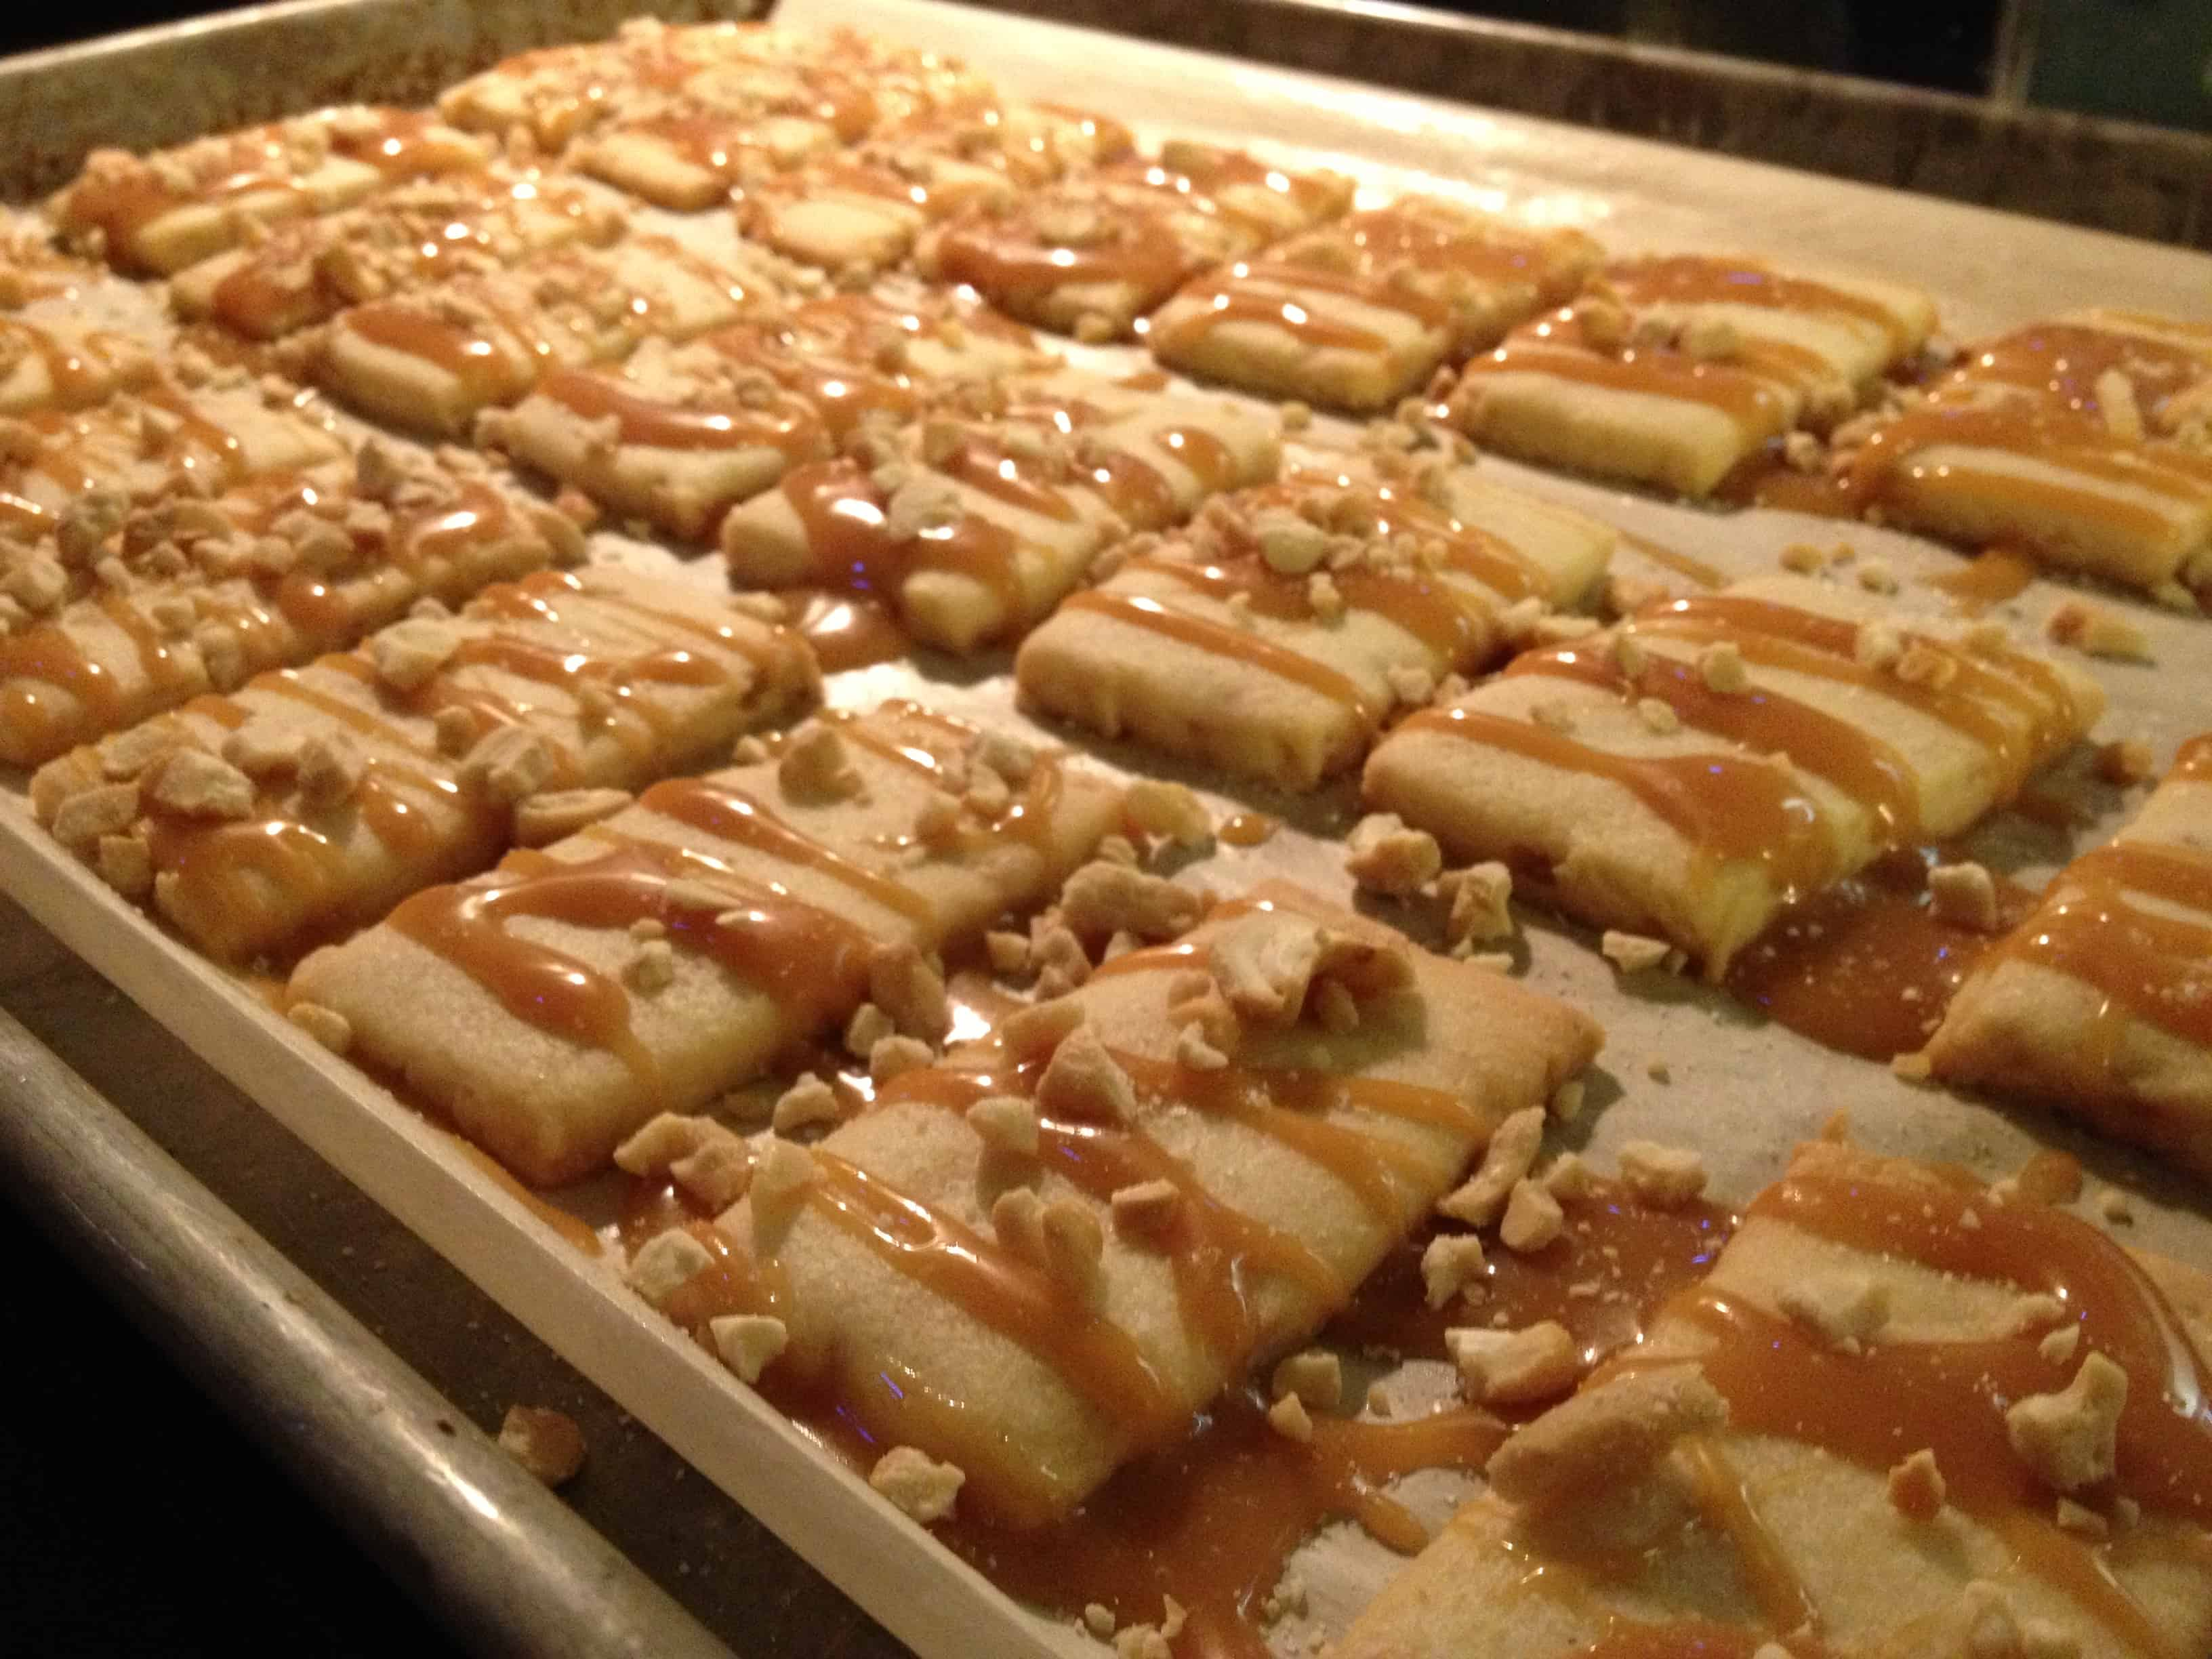 Salted Caramel & Cashew Cookies